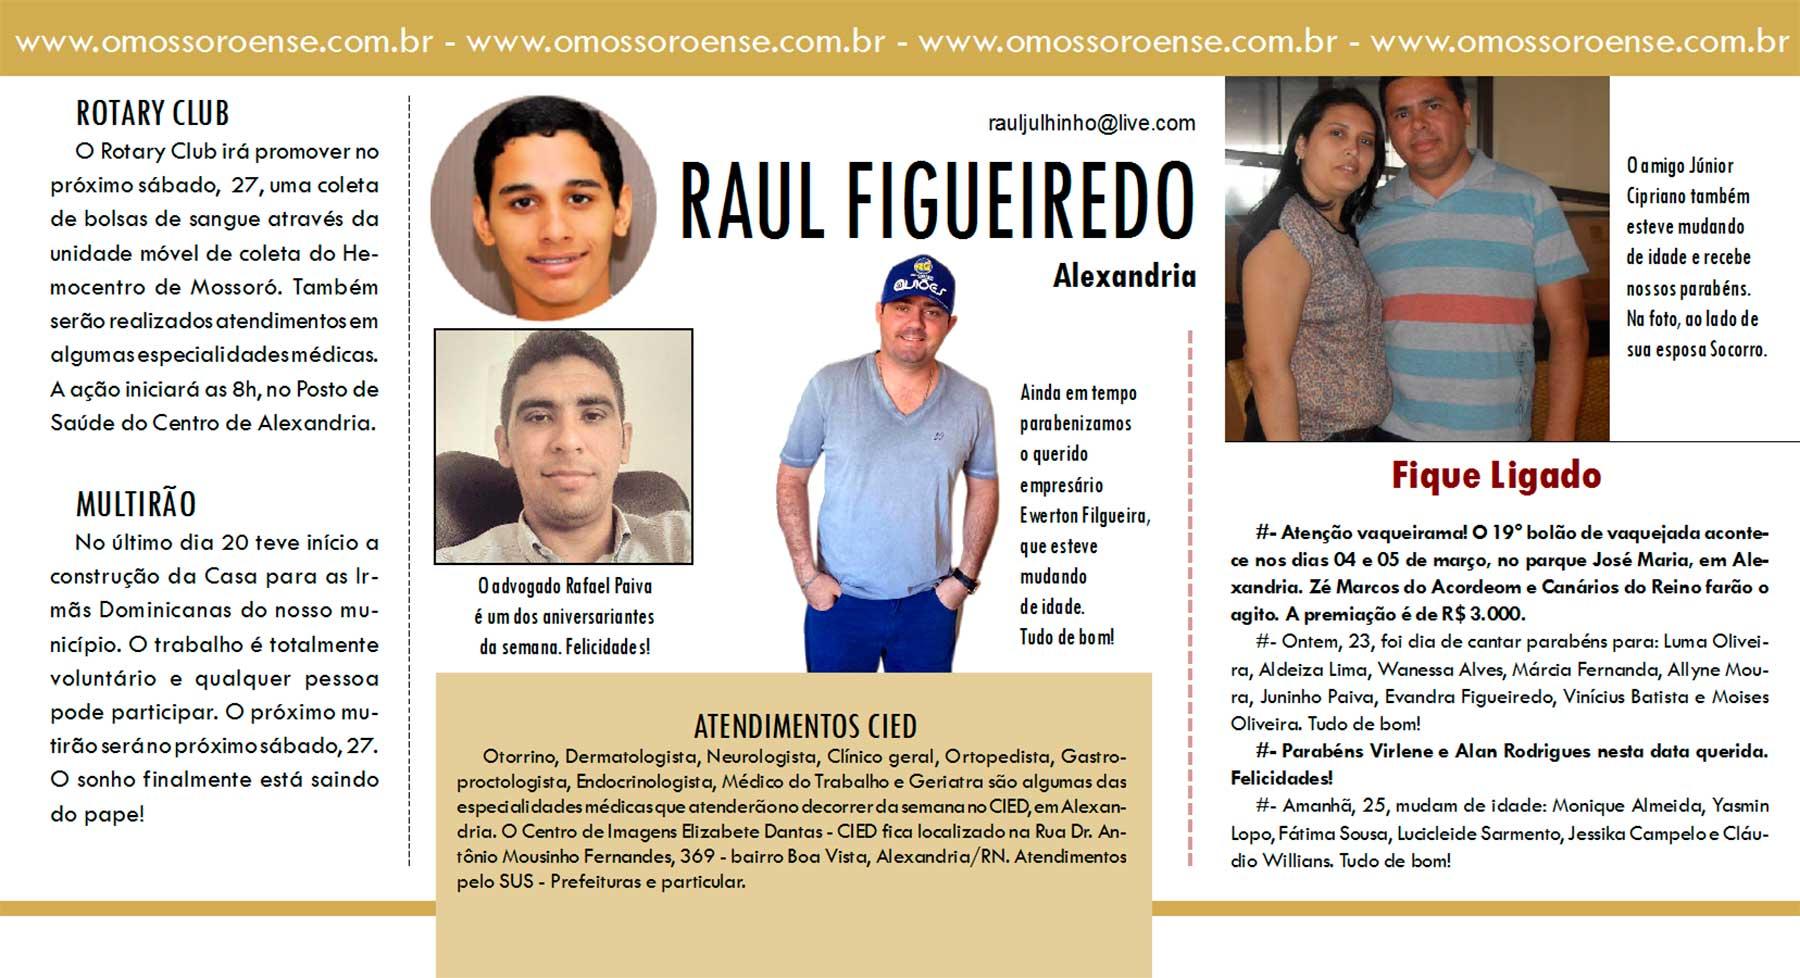 RAUL-FIGUEIREDO---ALEXANDRIA---24-02-2016